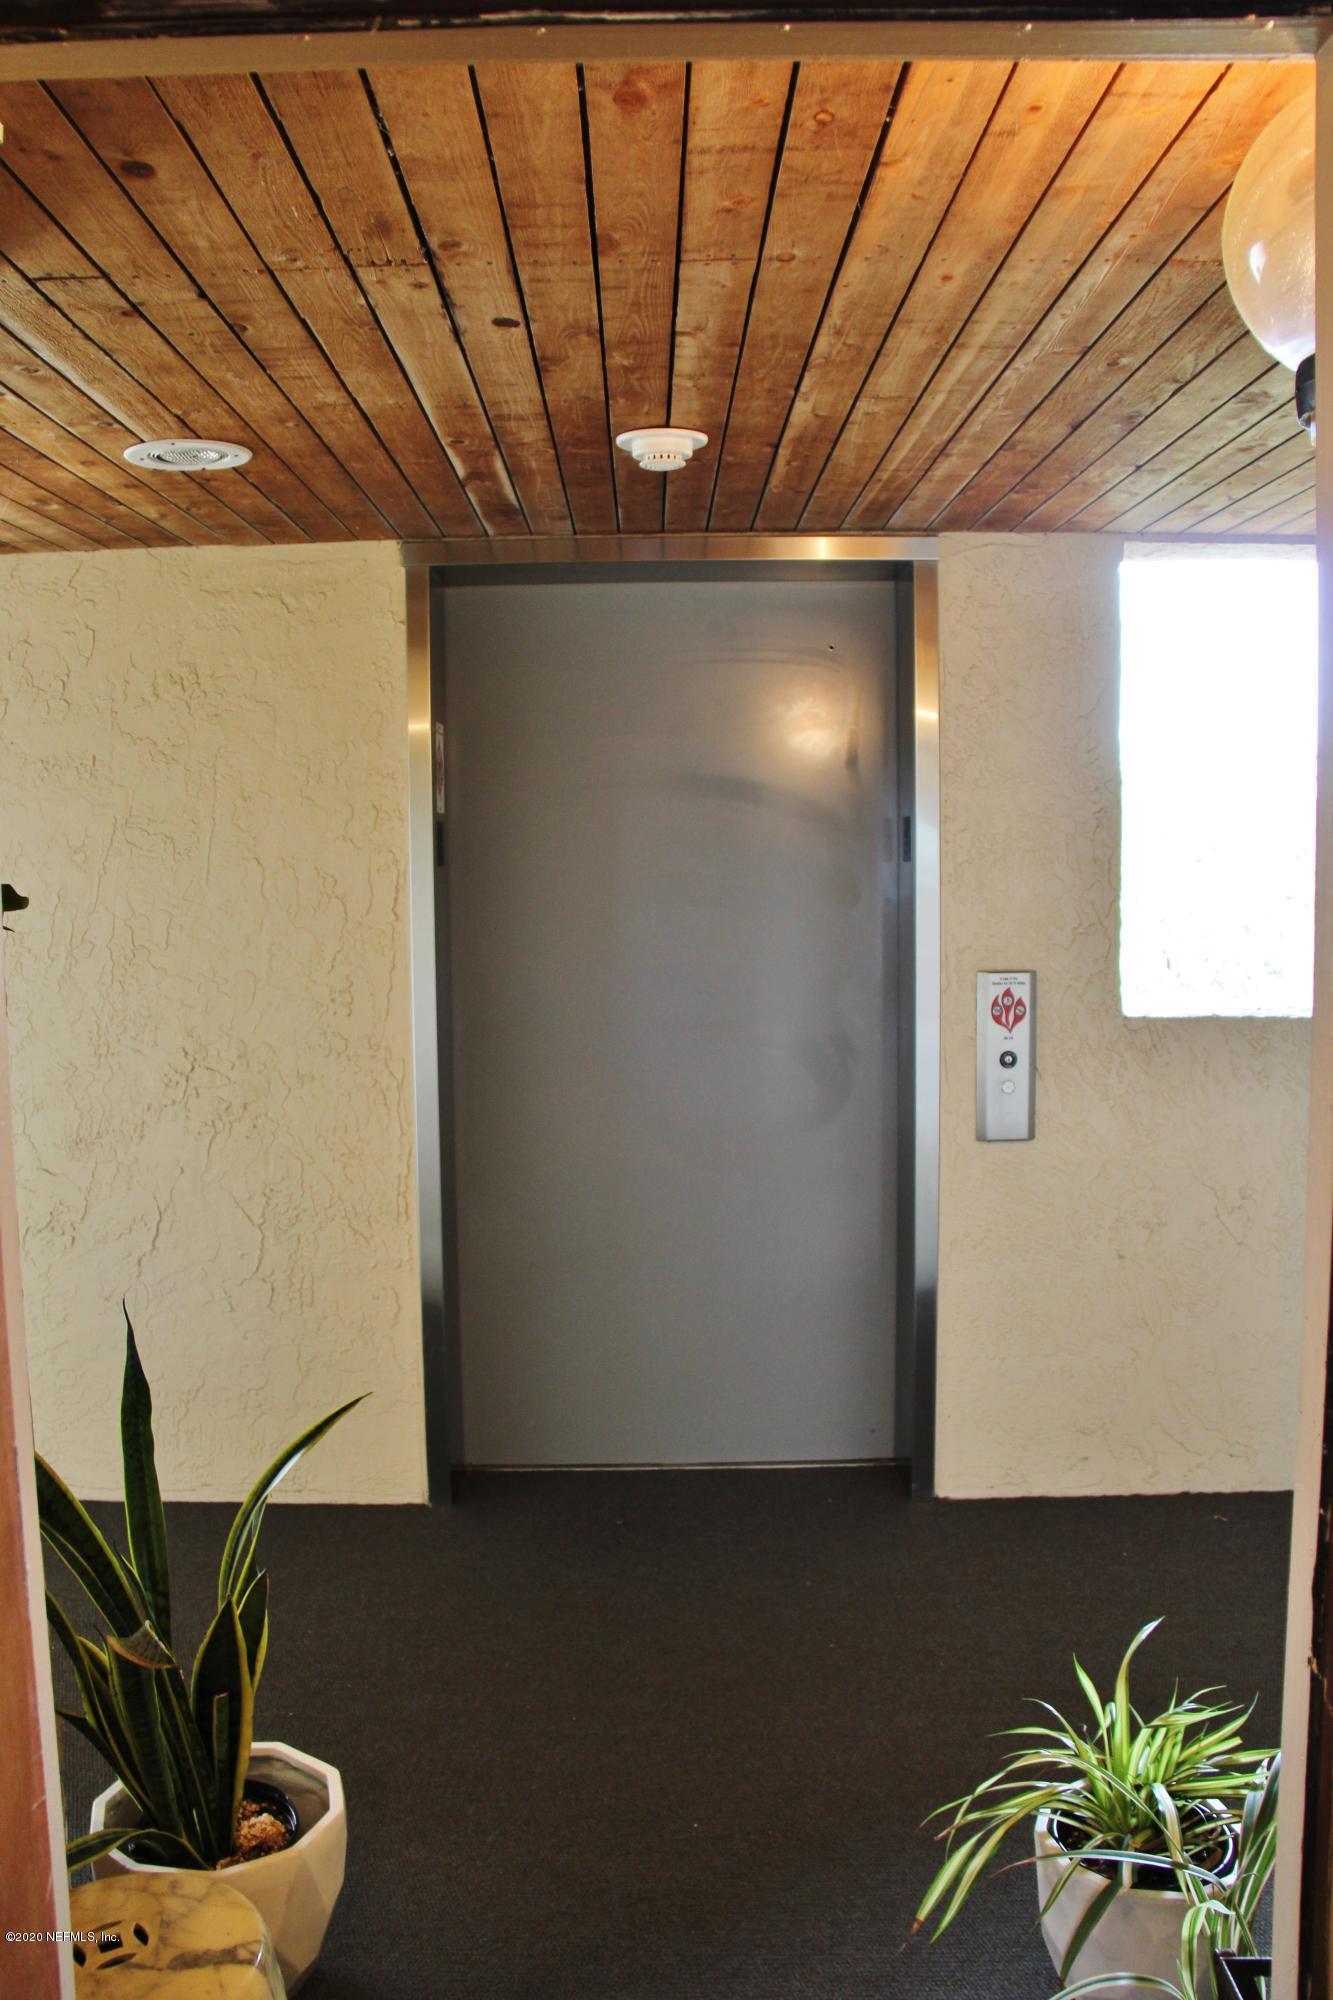 3116 HARBOR, ST AUGUSTINE, FLORIDA 32084, 2 Bedrooms Bedrooms, ,2 BathroomsBathrooms,Residential,For sale,HARBOR,1057995